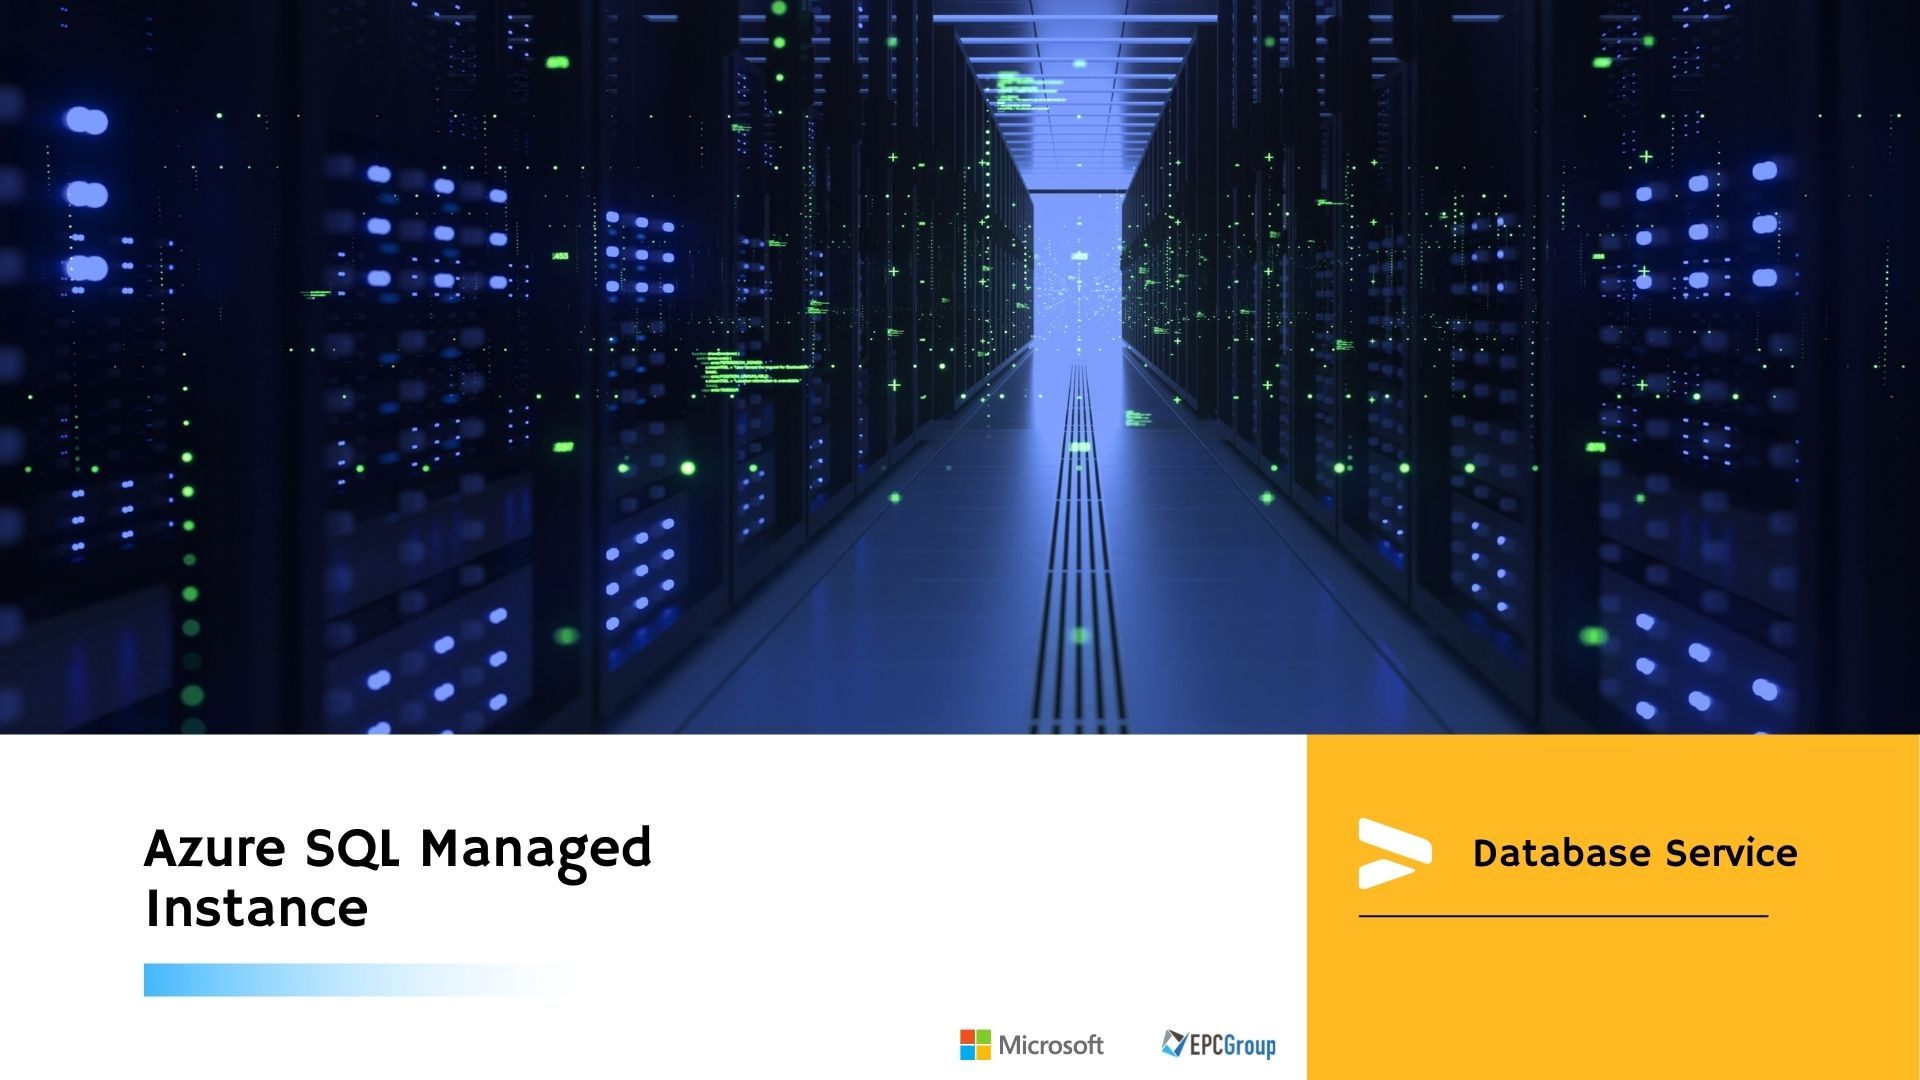 MS Azure SQL Managed Instance: Intelligent, Scalable Cloud Database Service - thumb image